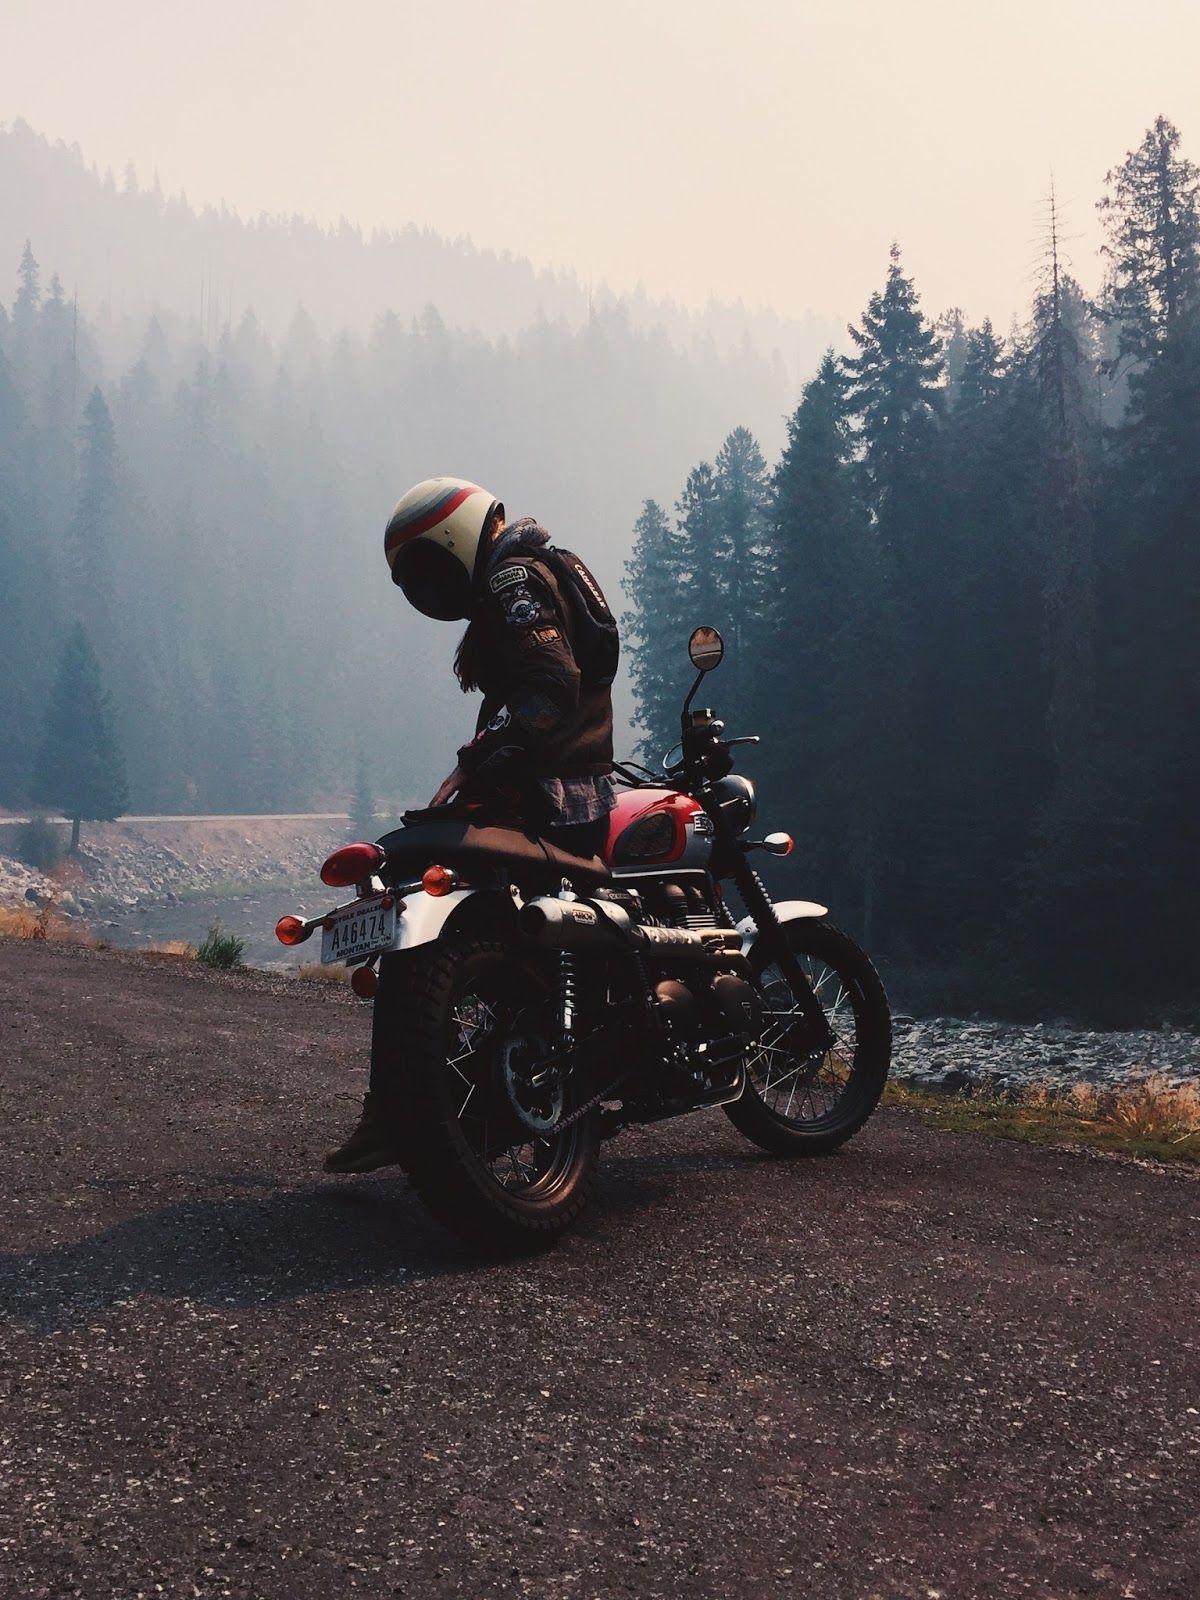 Montana Meet Up With Iron & Air (Moto Mucci) #motorcyclesgirls #chicasmoteras   …